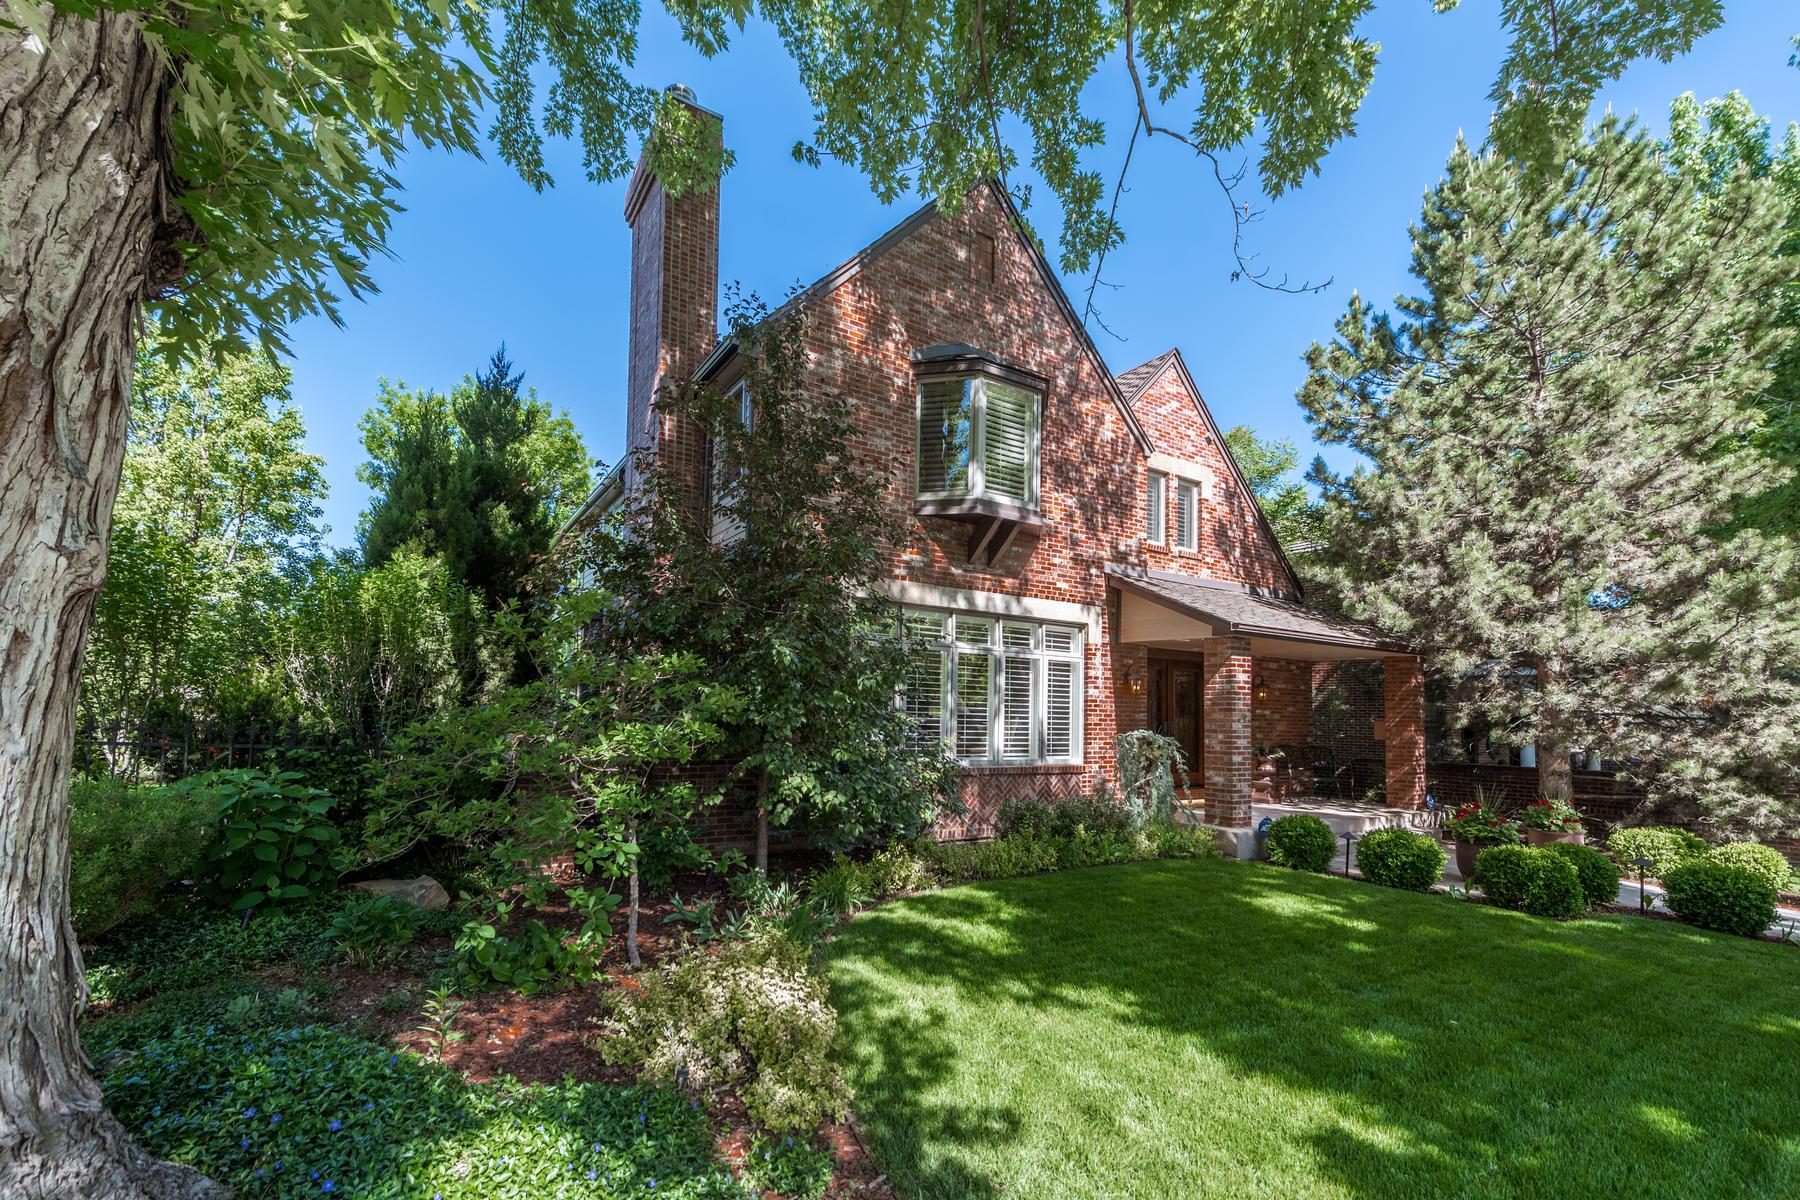 Single Family Home for Active at 385 Monroe Street 385 Monroe Street Denver, Colorado 80206 United States